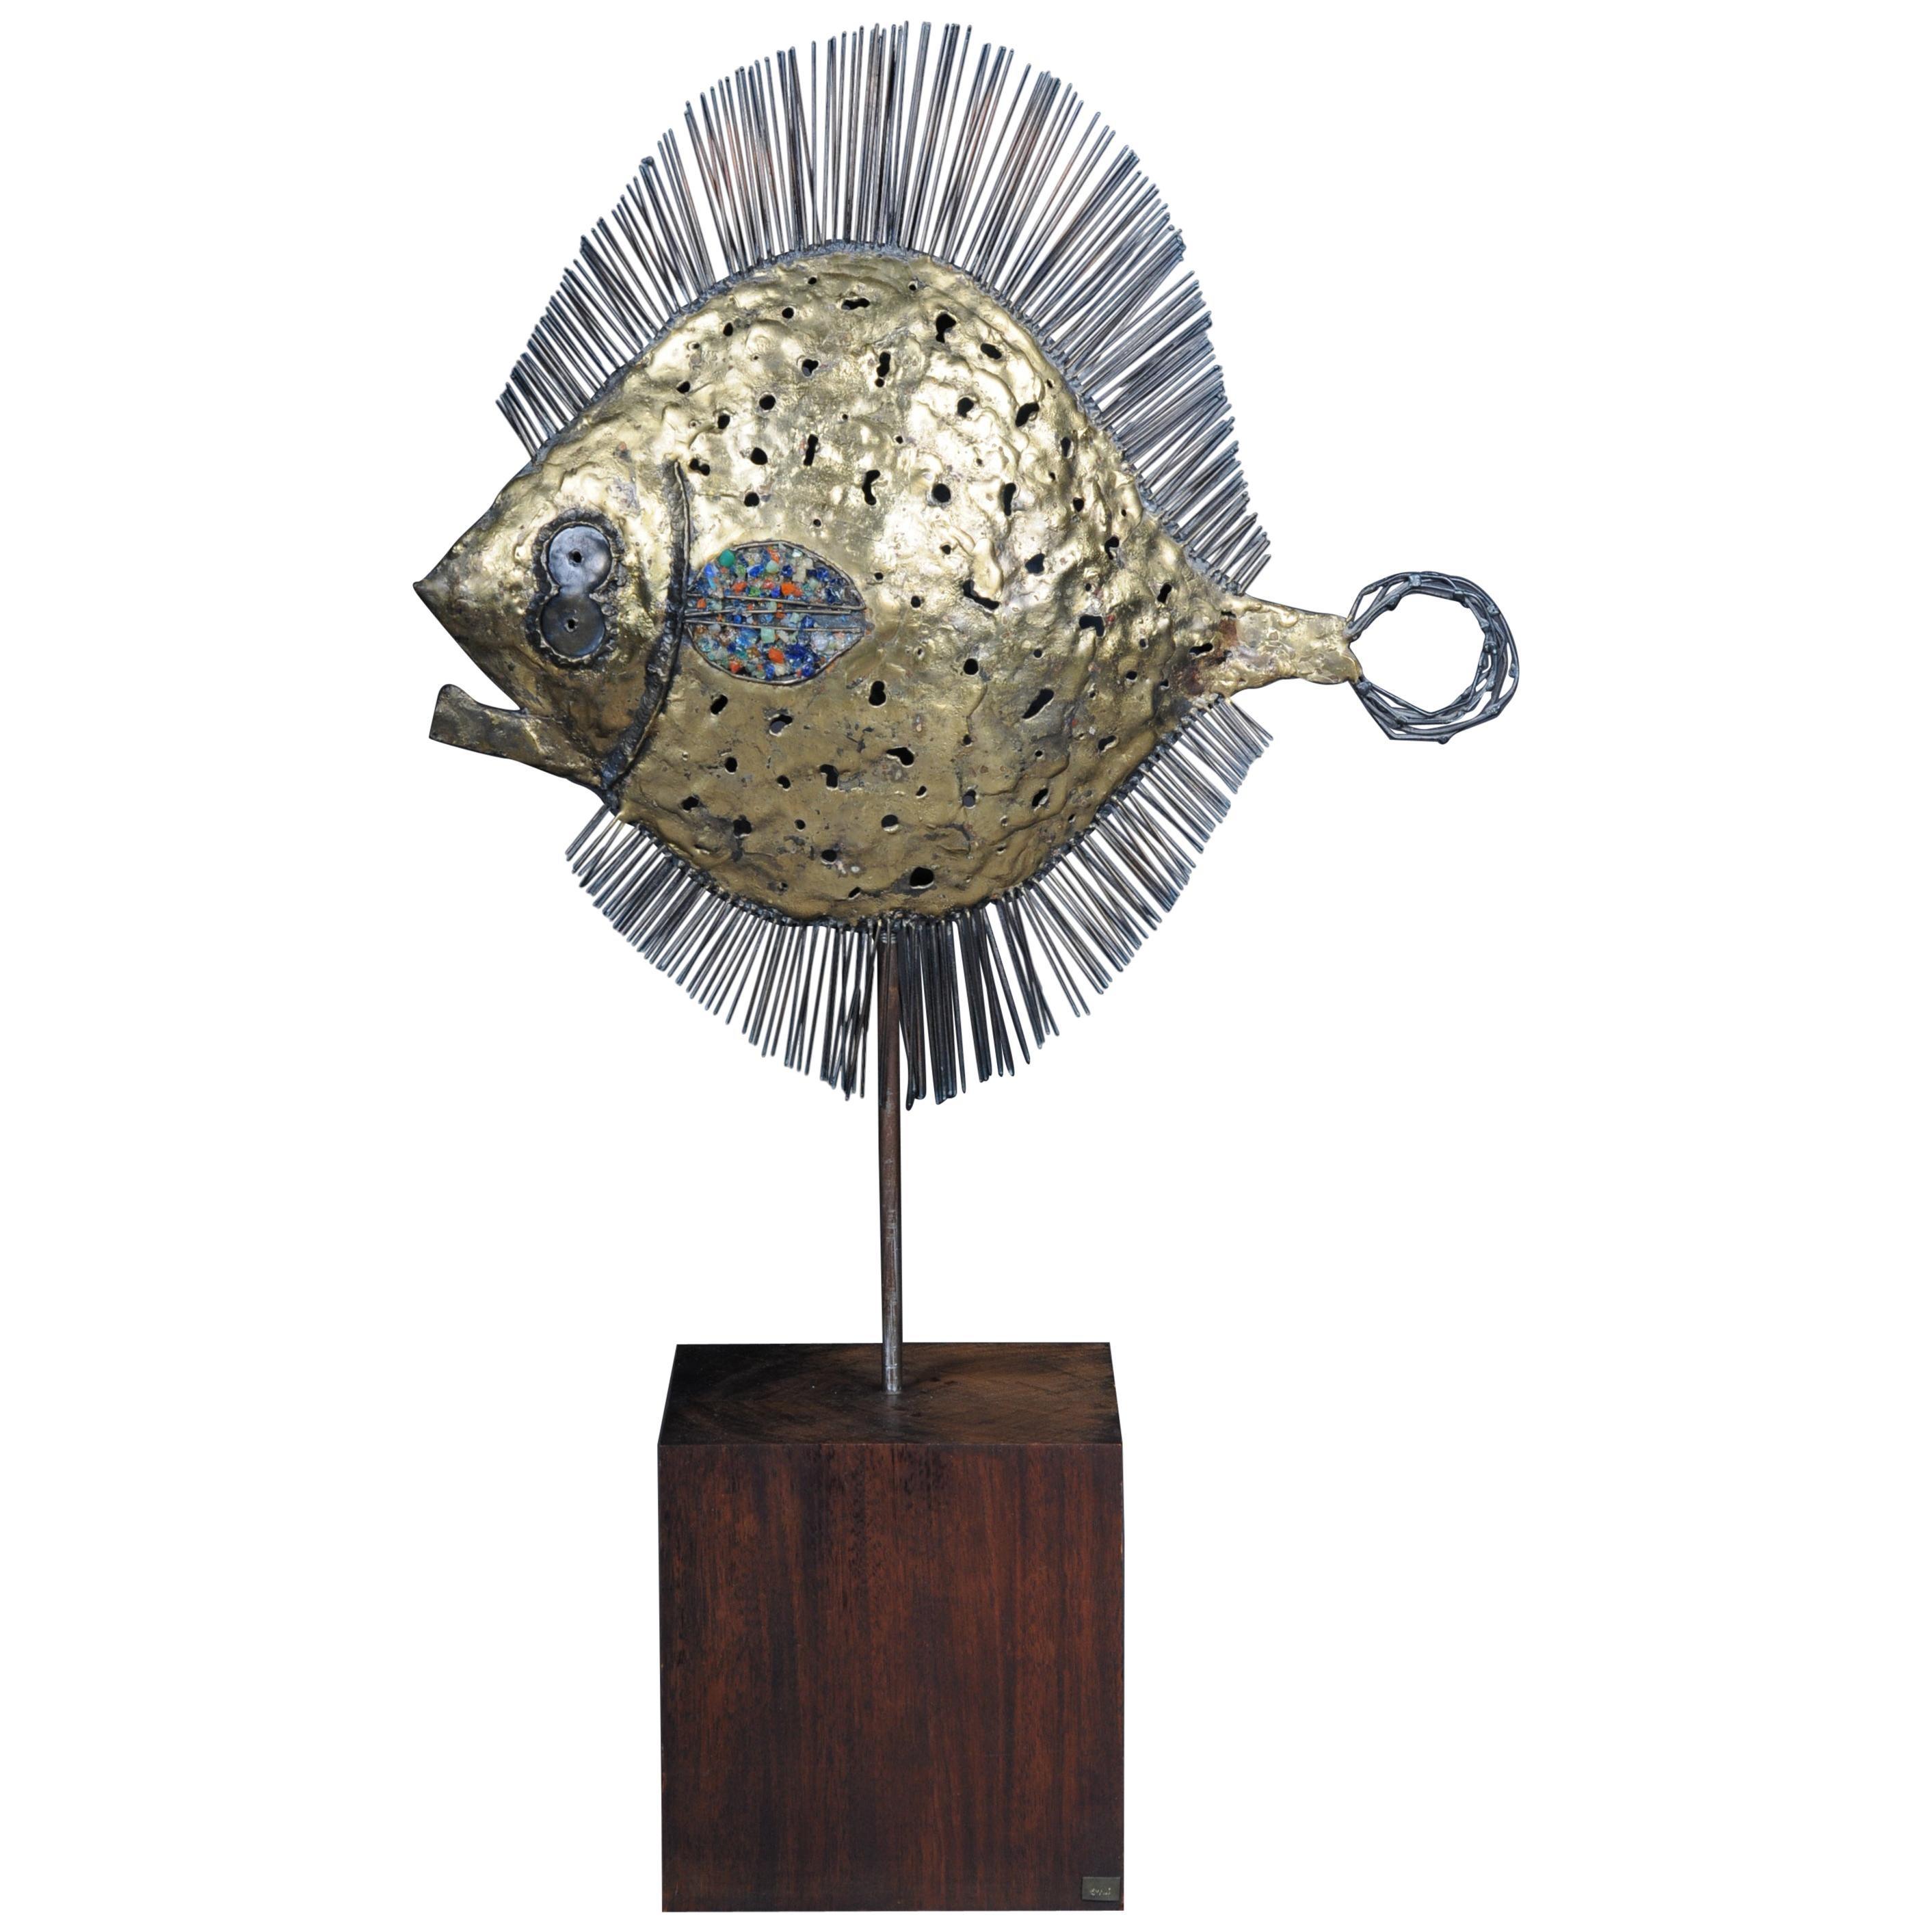 Curious and Decorative Puffer Fish Sculpture, Brass